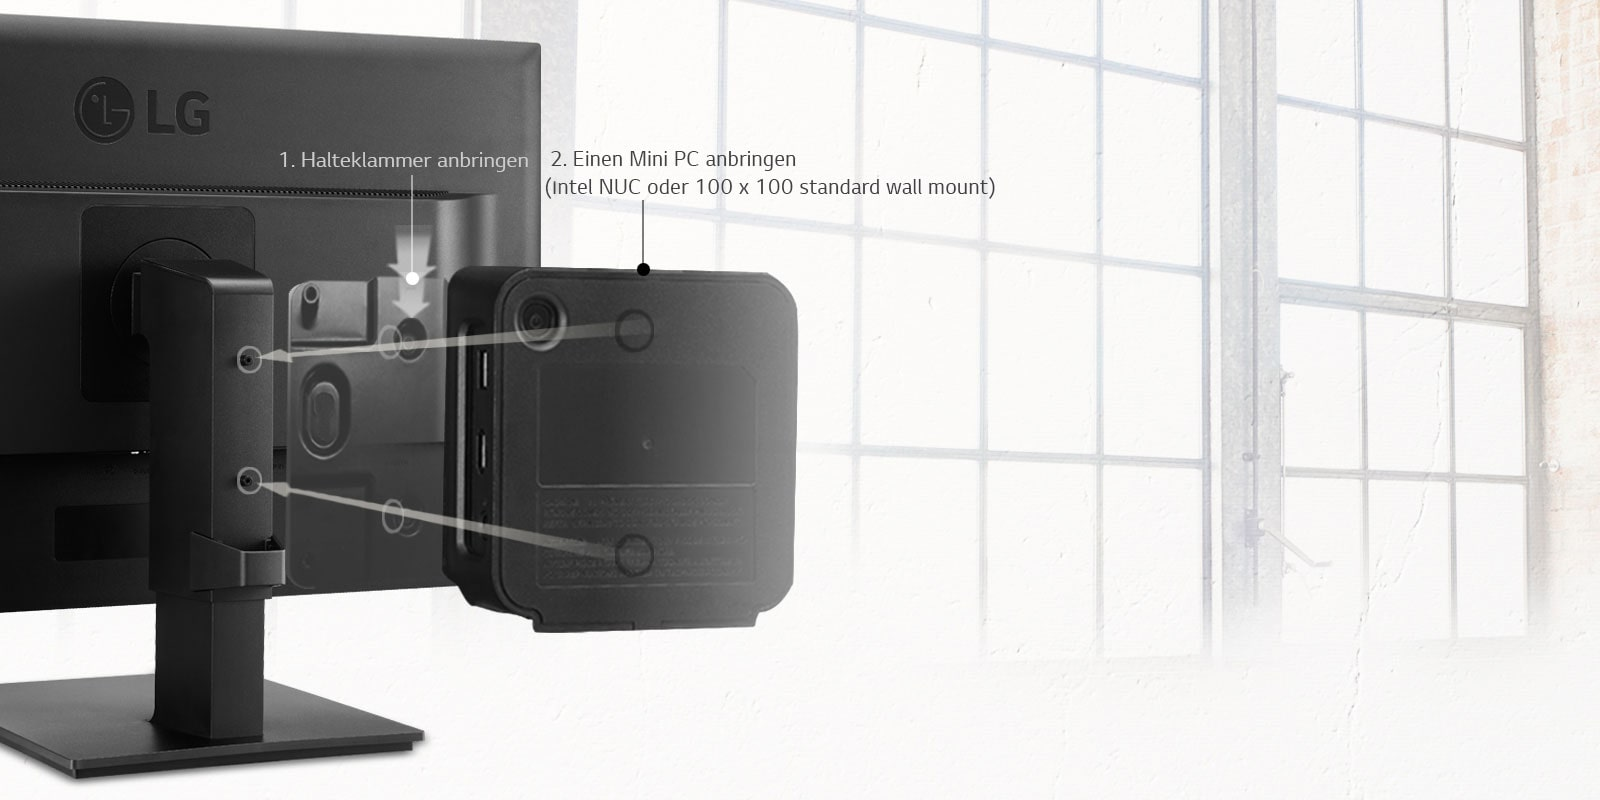 Mini PC Verbindung möglich1